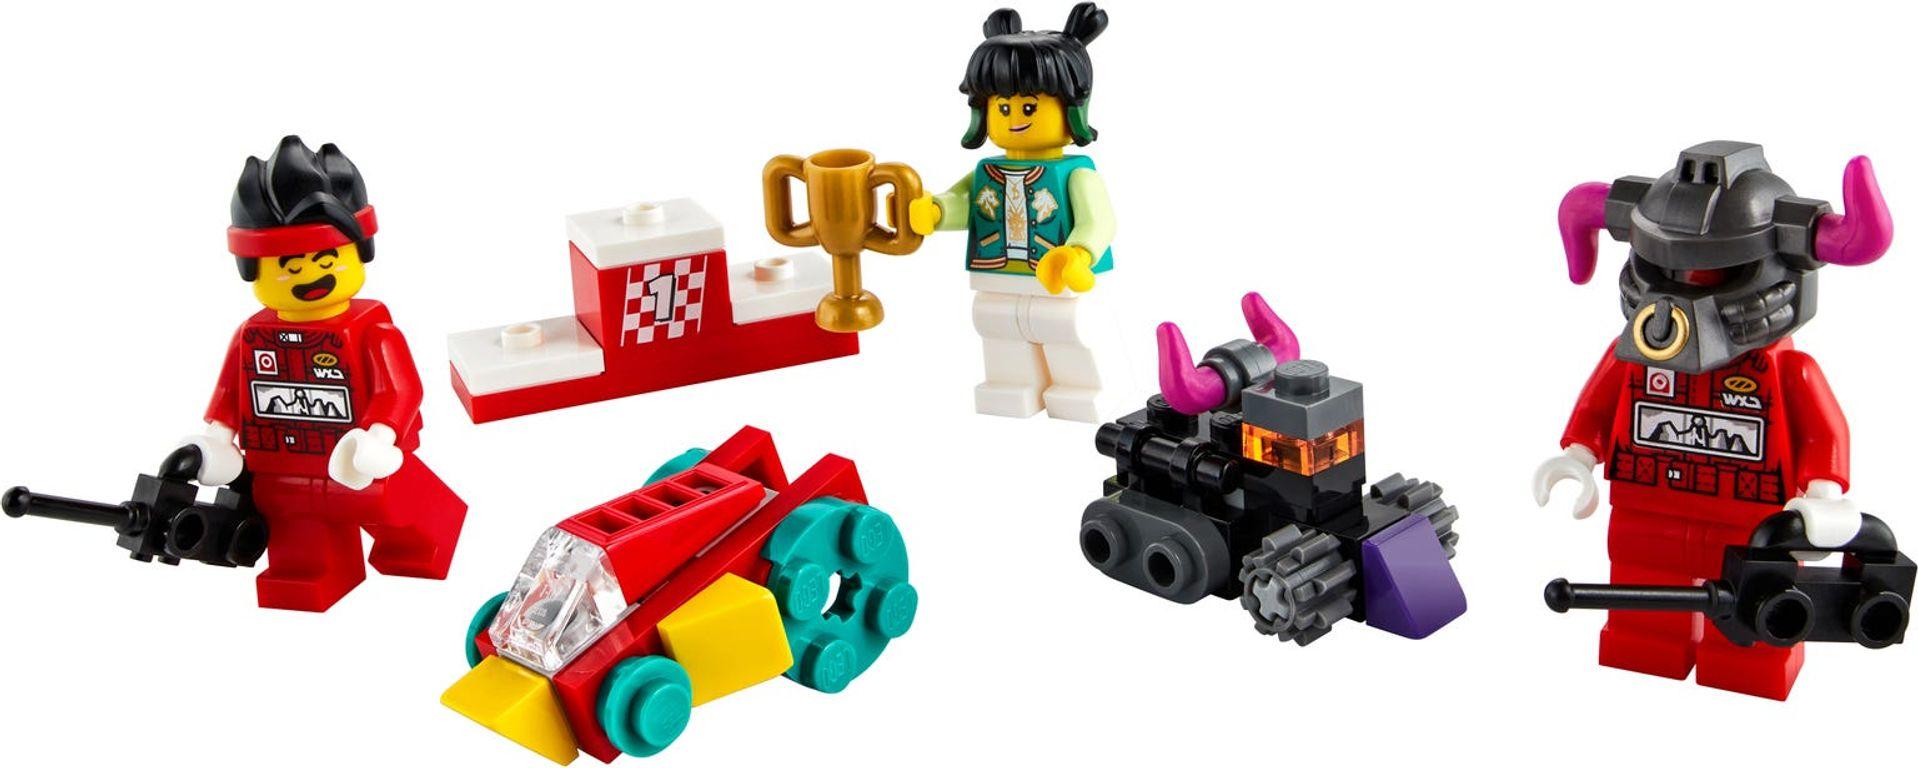 LEGO® Monkie Kid Monkie Kid's Cloud Bike minifigures